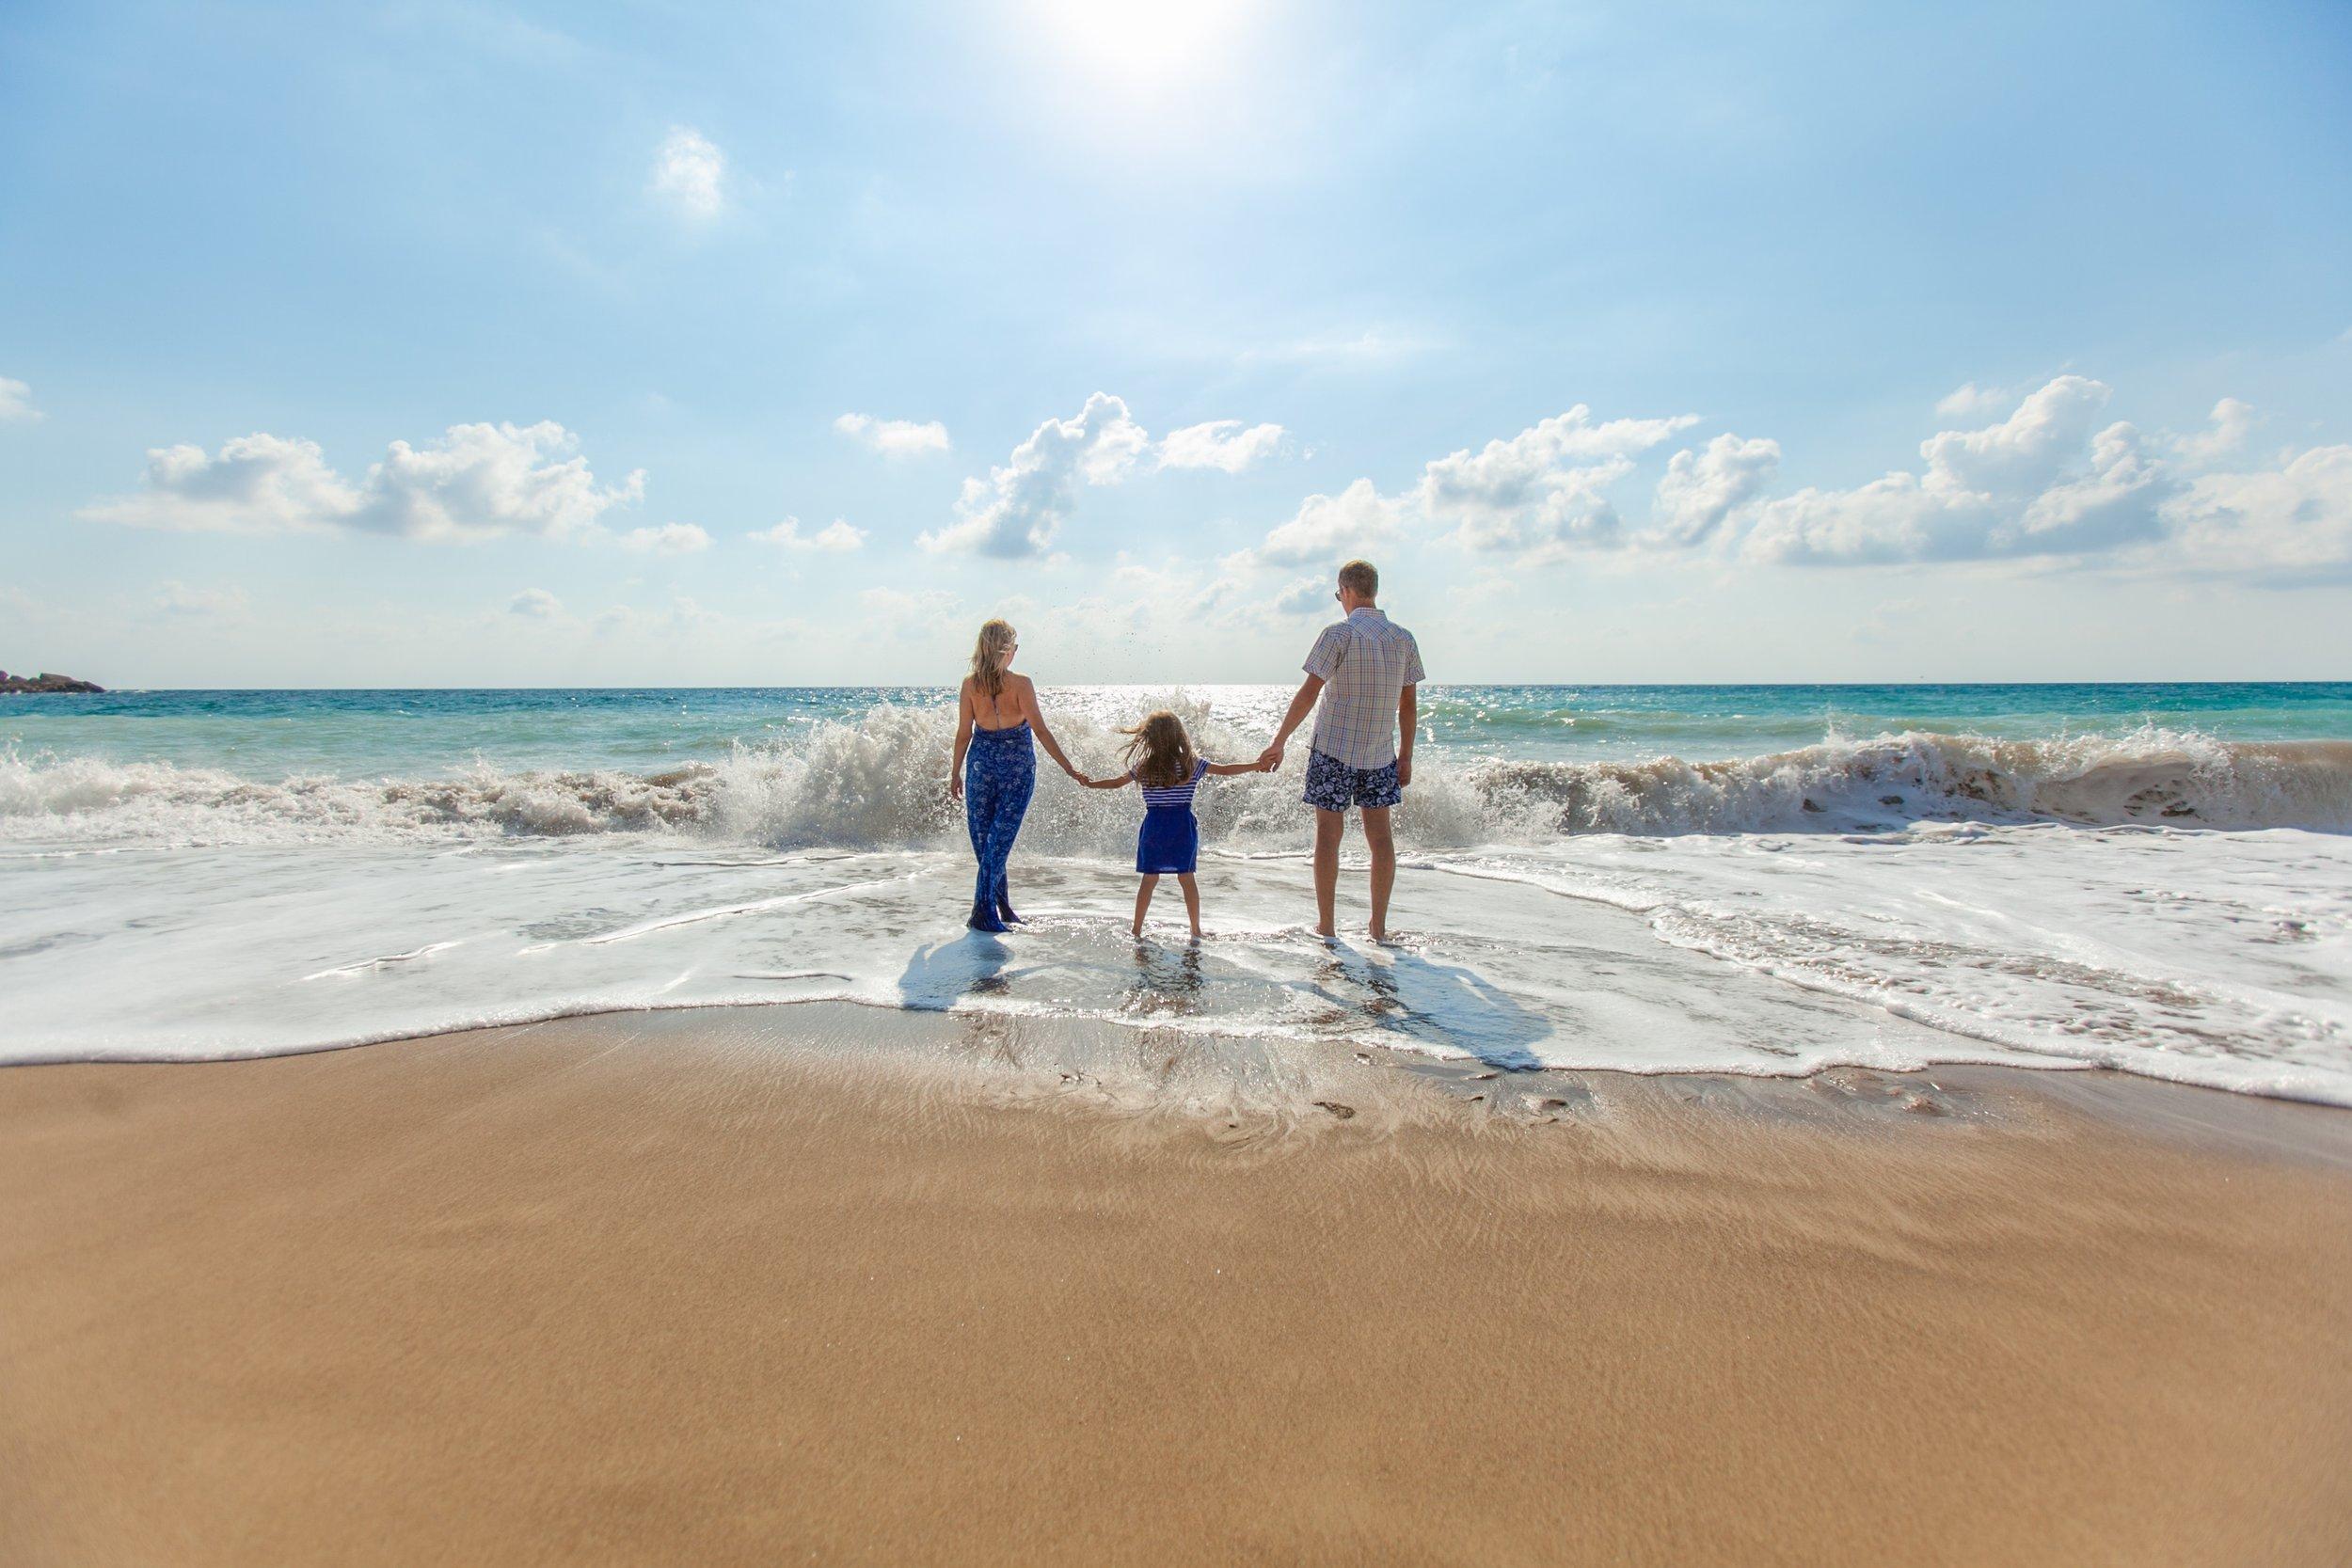 En hyggelig familietur til de spanske strande.